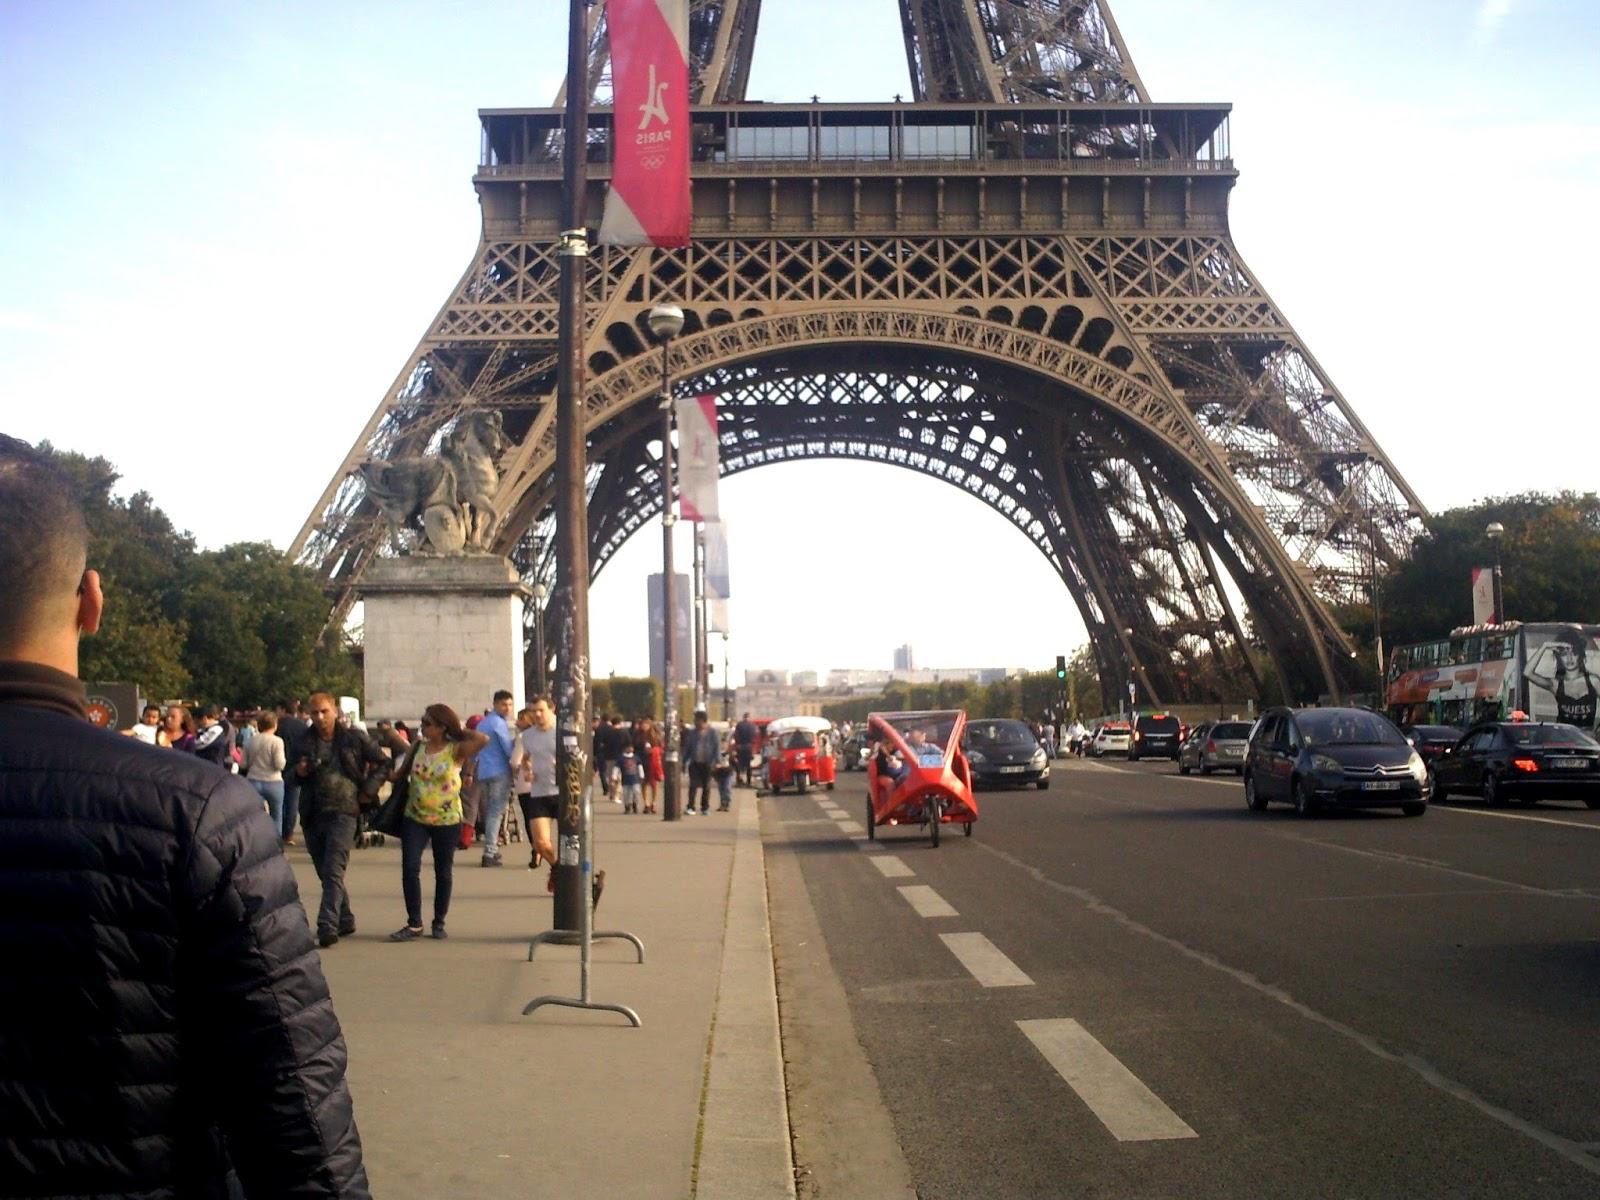 attentat, eiffel, mur, paris, plexiglas, terrorisme, tour, état, urgence, salafiste, propagande, france, propagande, al qaeda, daesh, daech, isis, islamique